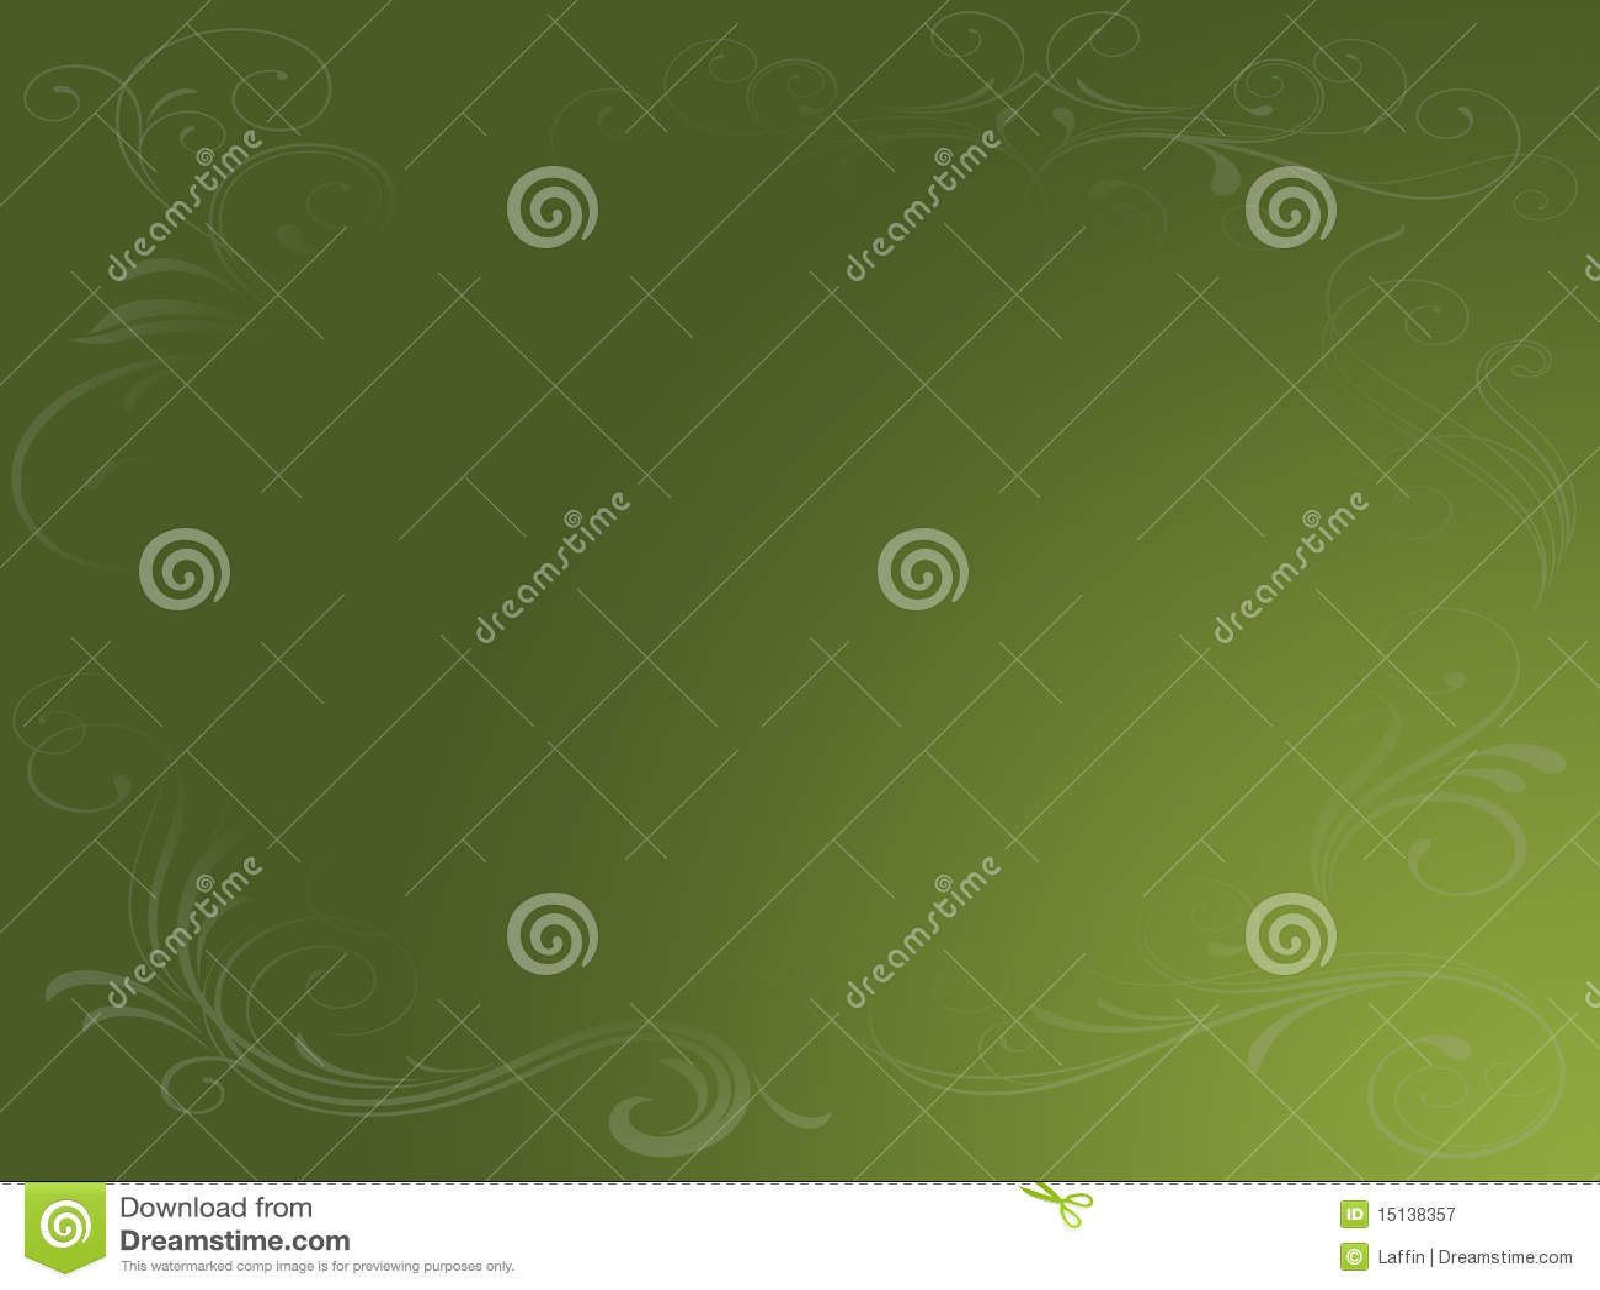 earthy green background - photo #6